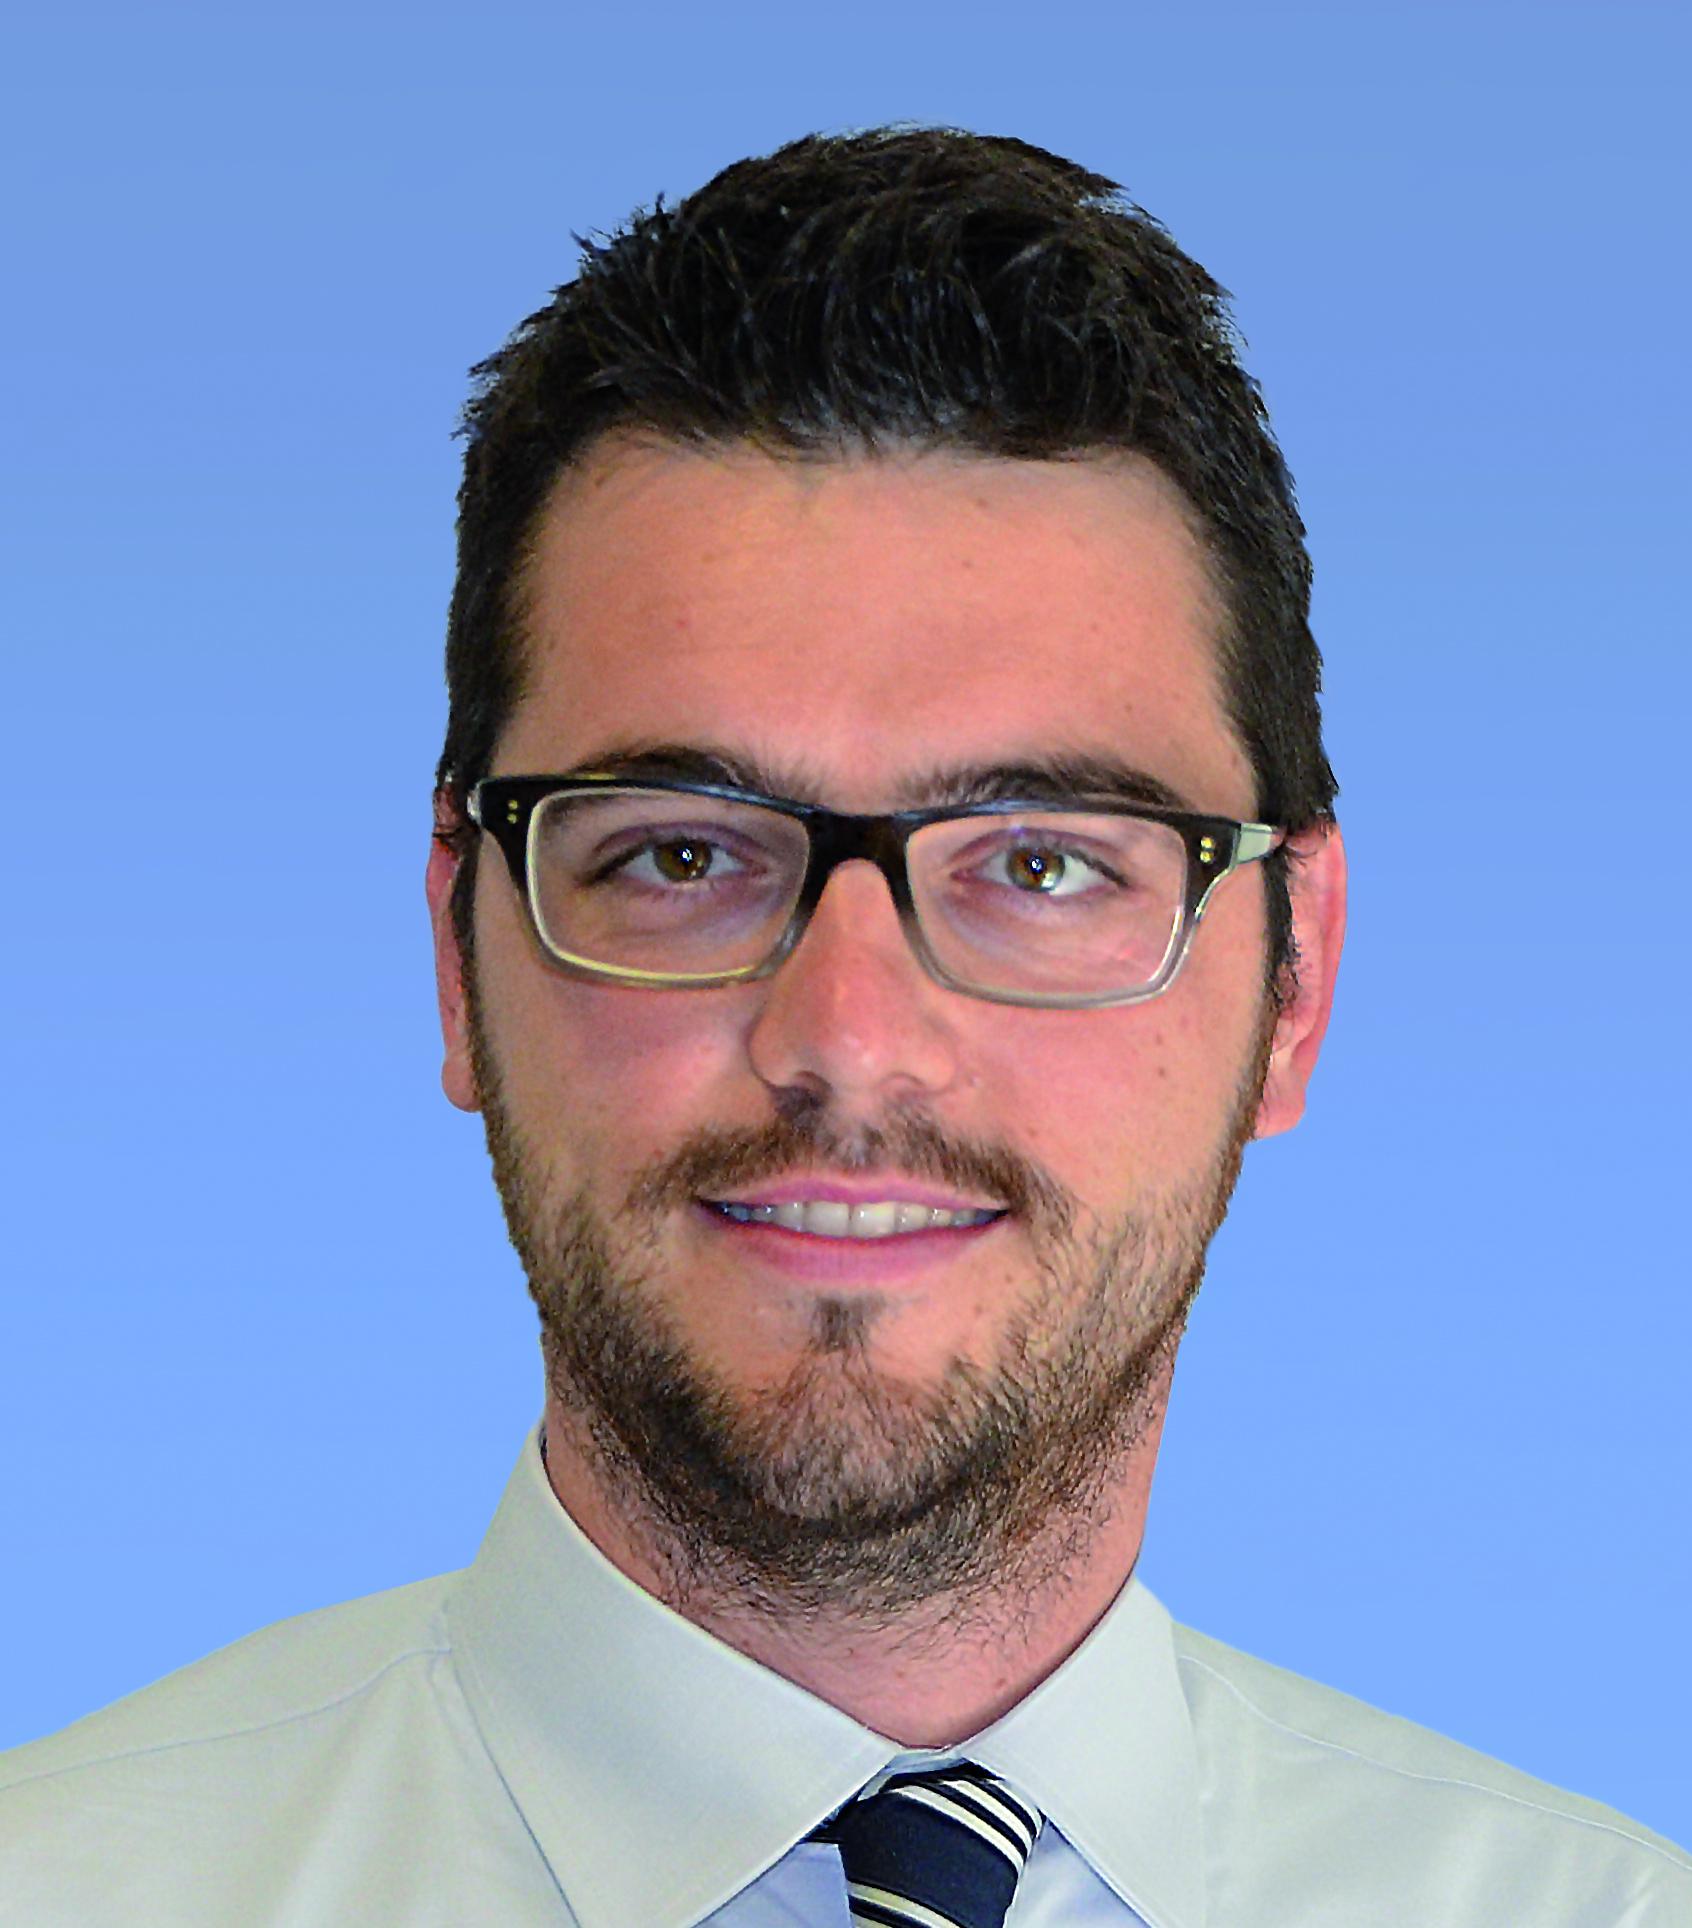 Damiano Frosi